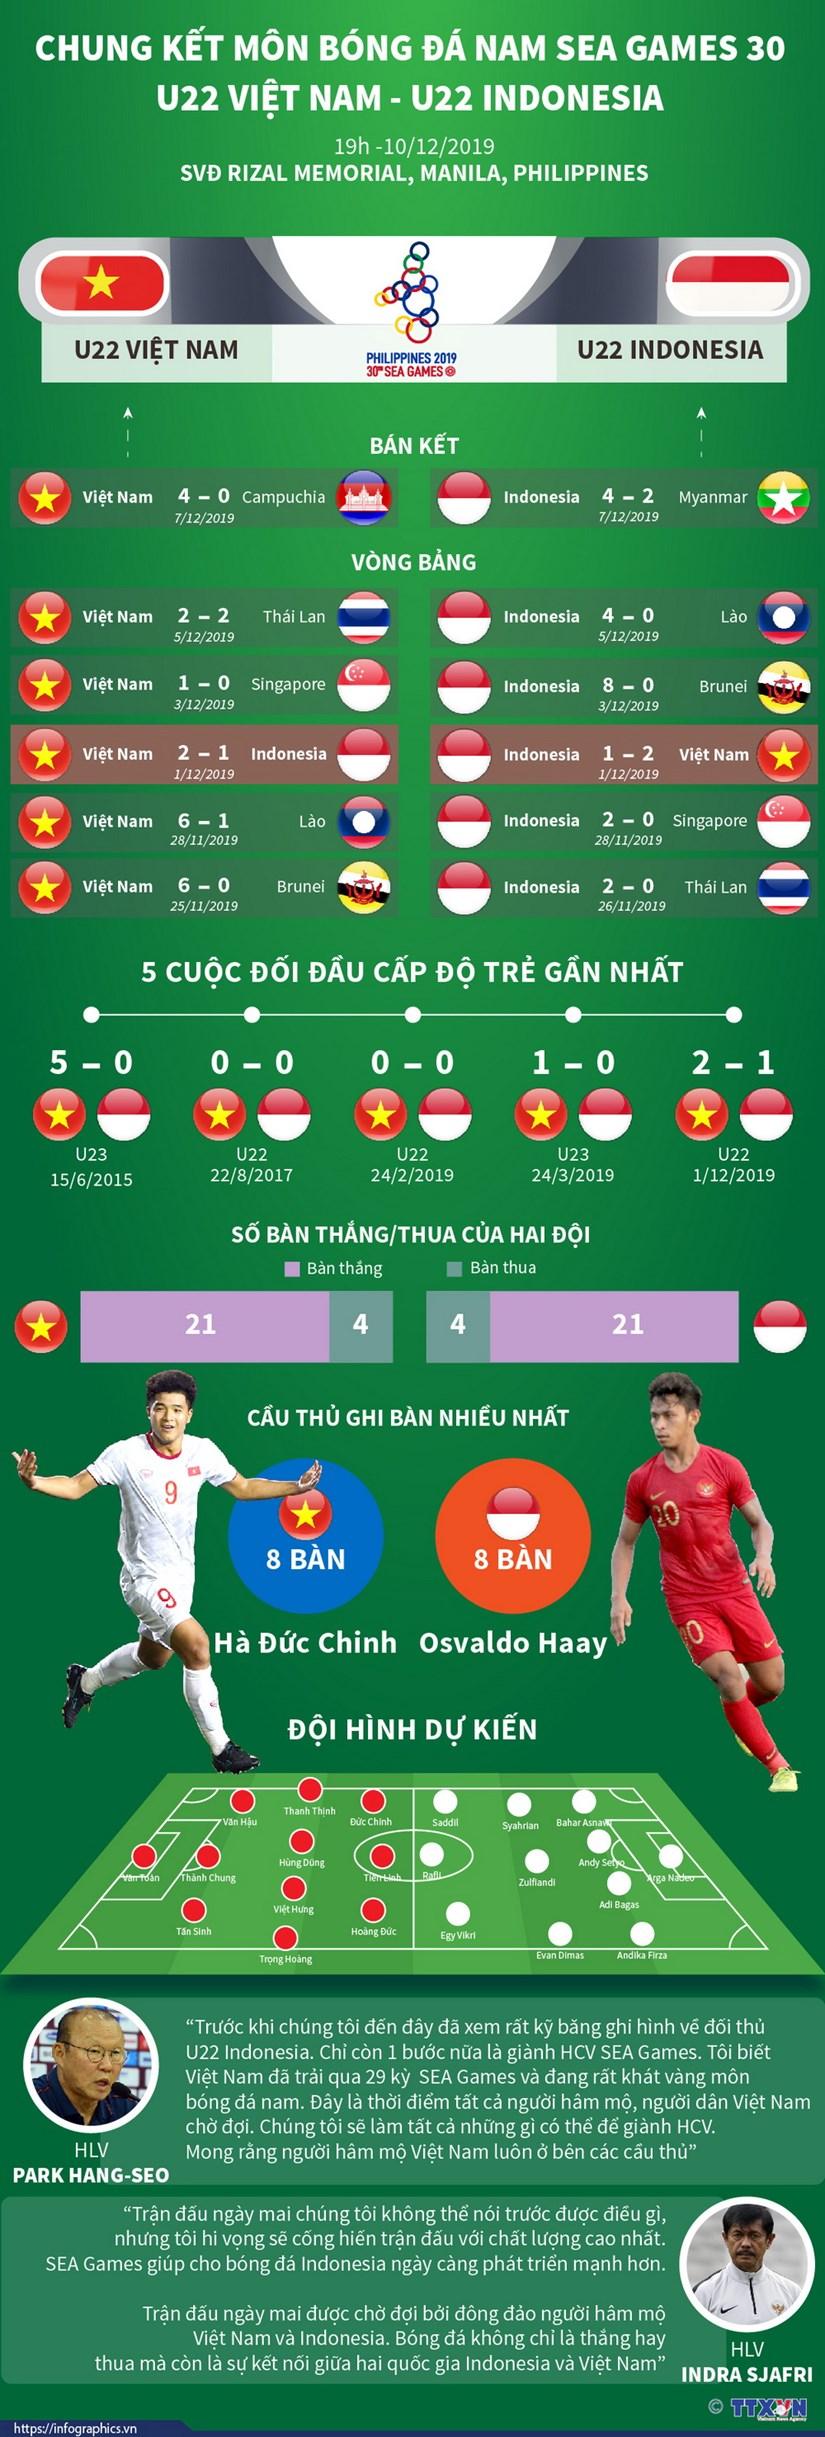 SEA Games 30: U22 Viet Nam quyet ha Indonesia, tiep noi tuyen nu hinh anh 1